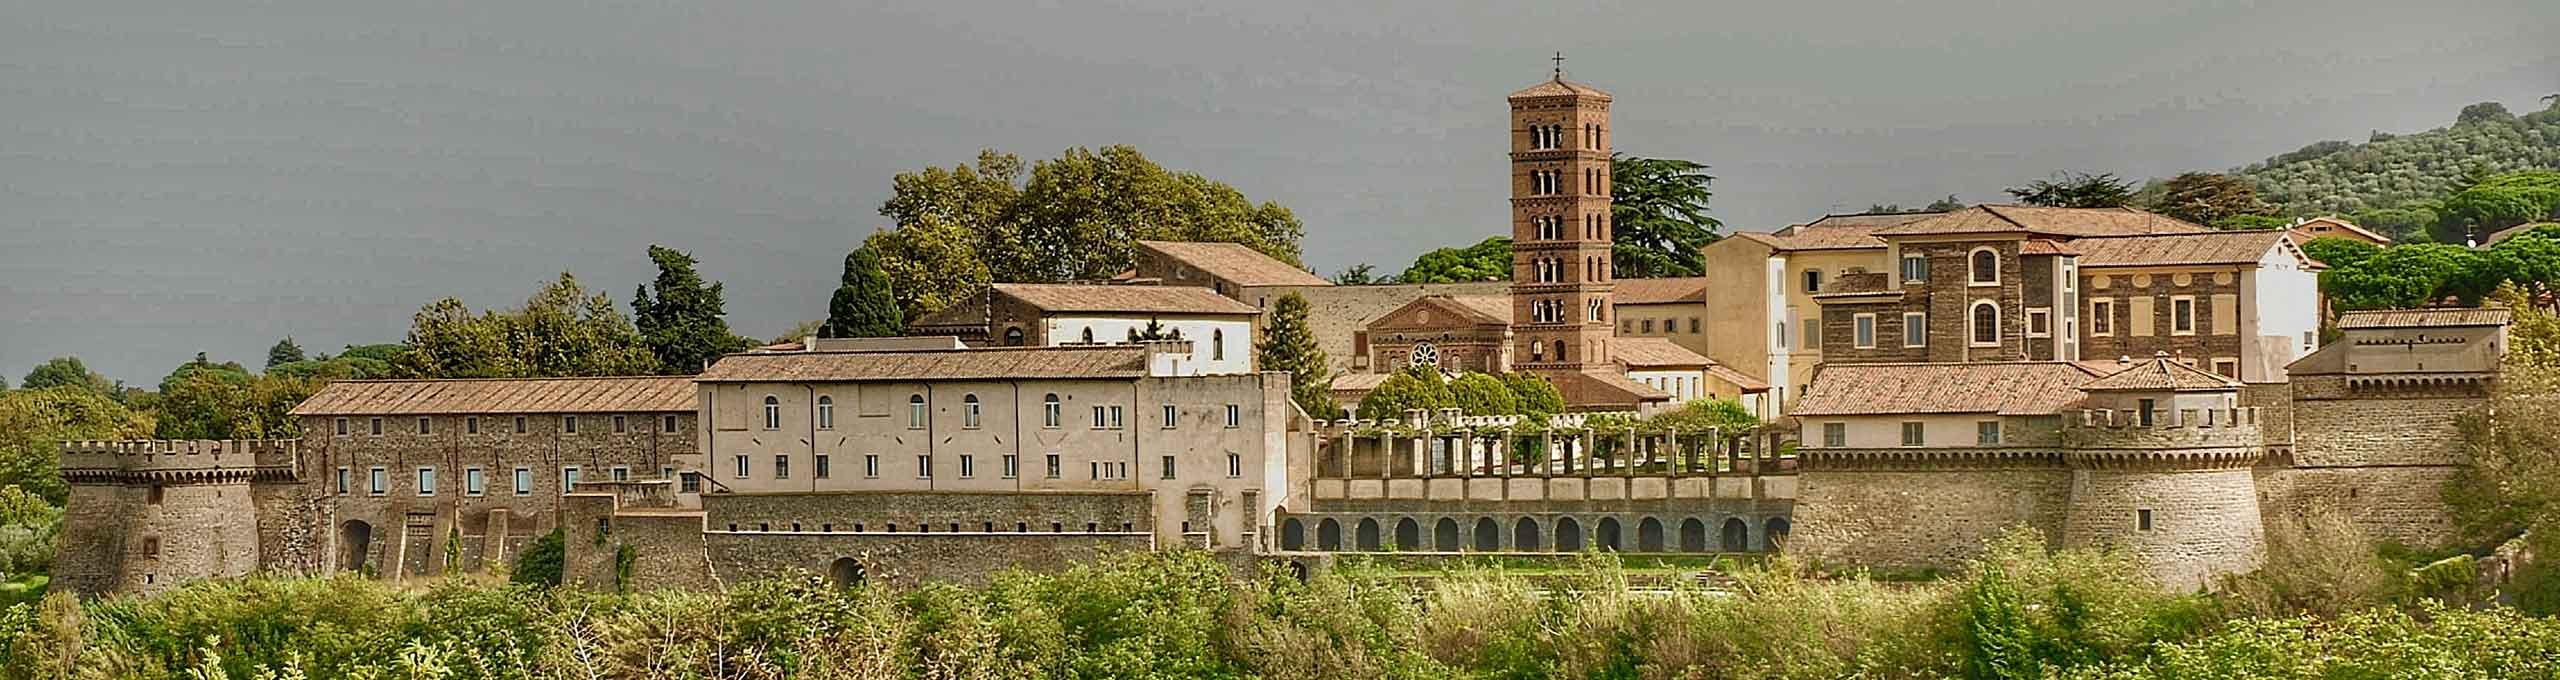 Grottaferrata, Castelli Romani